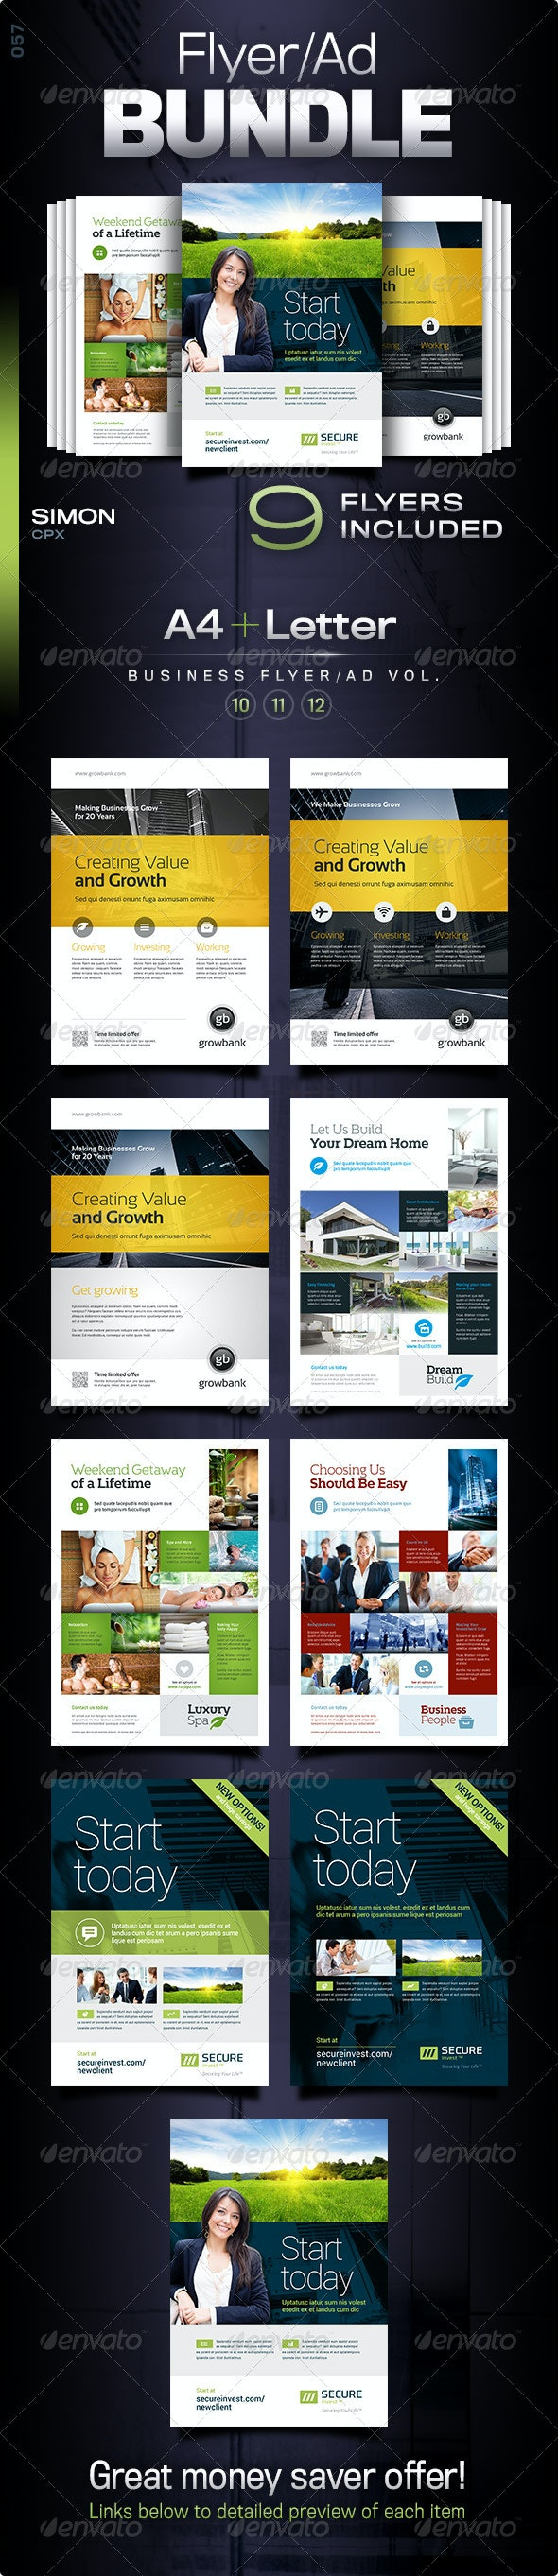 Business Flyer/Ad Bundle Vol. 10-11-12 - Corporate Flyers